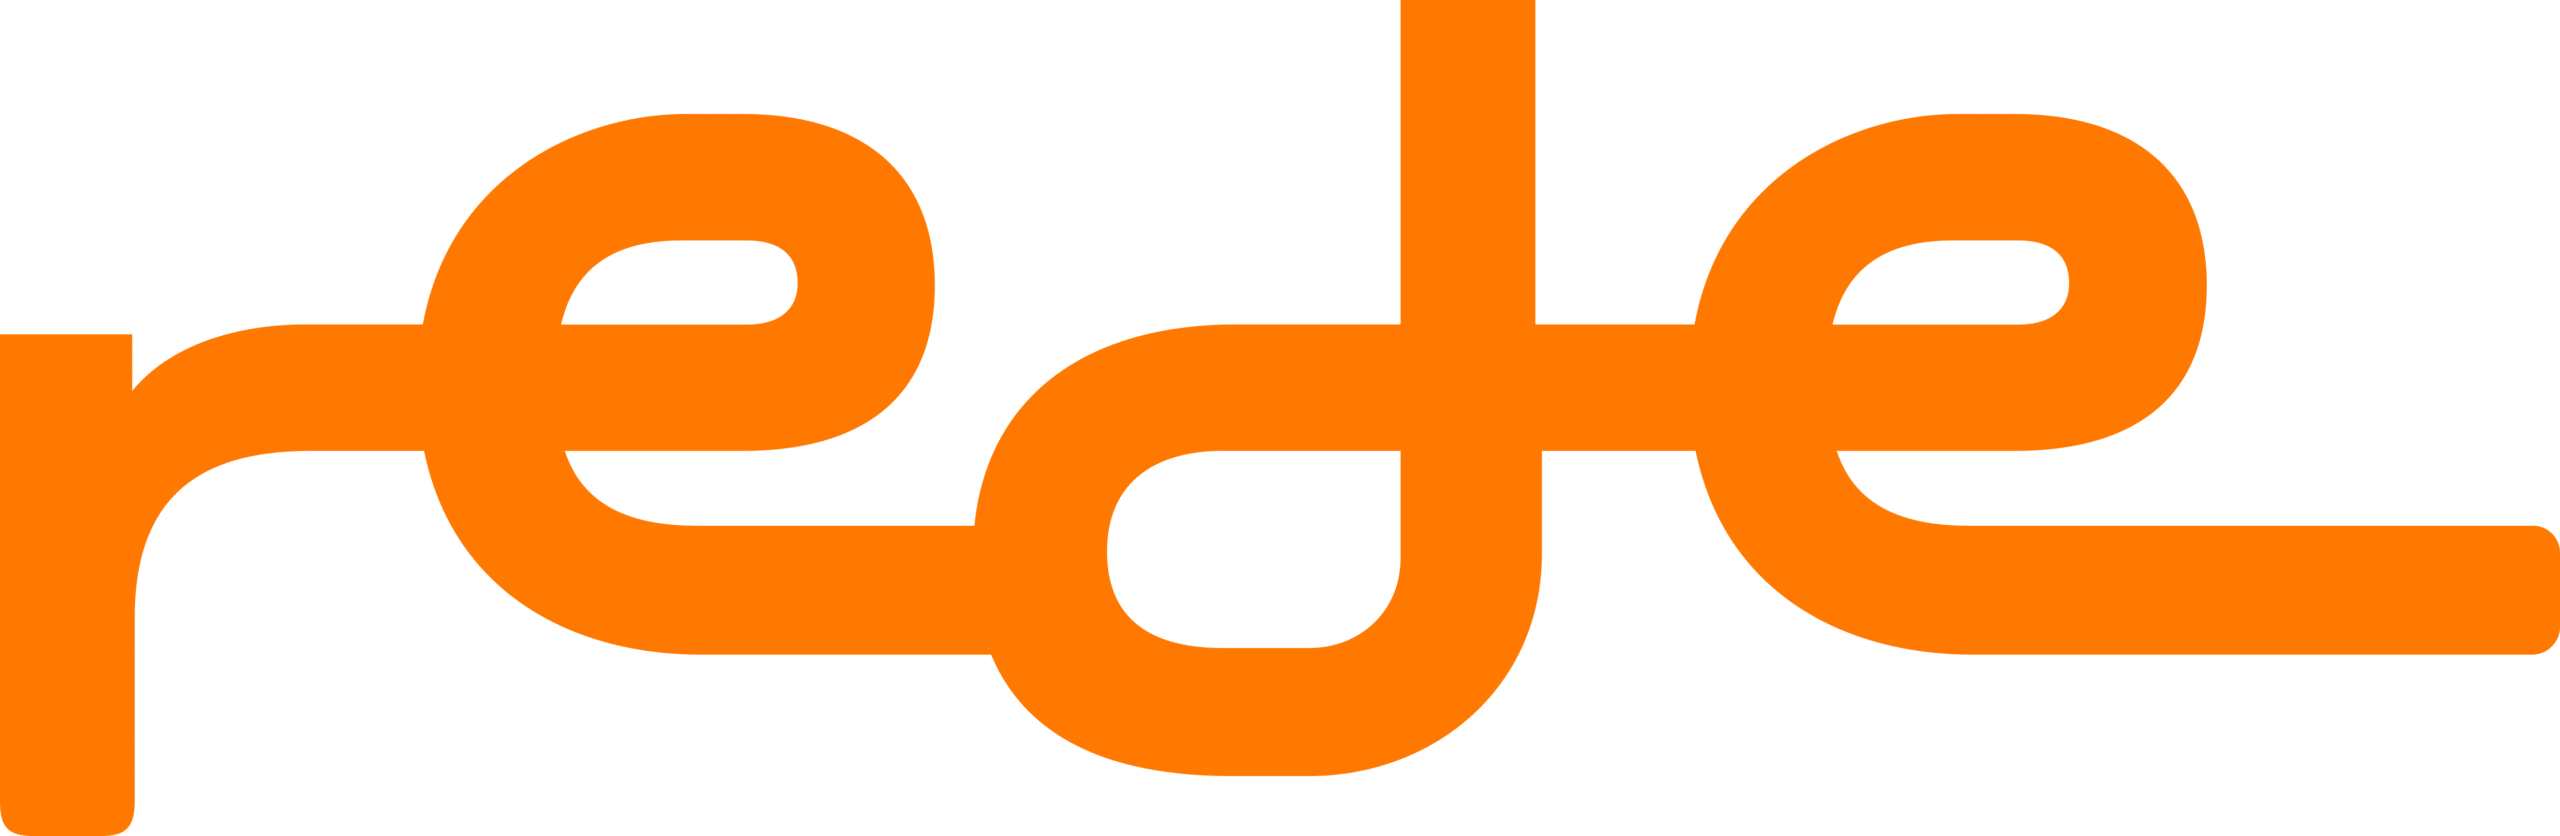 rede-logo-1